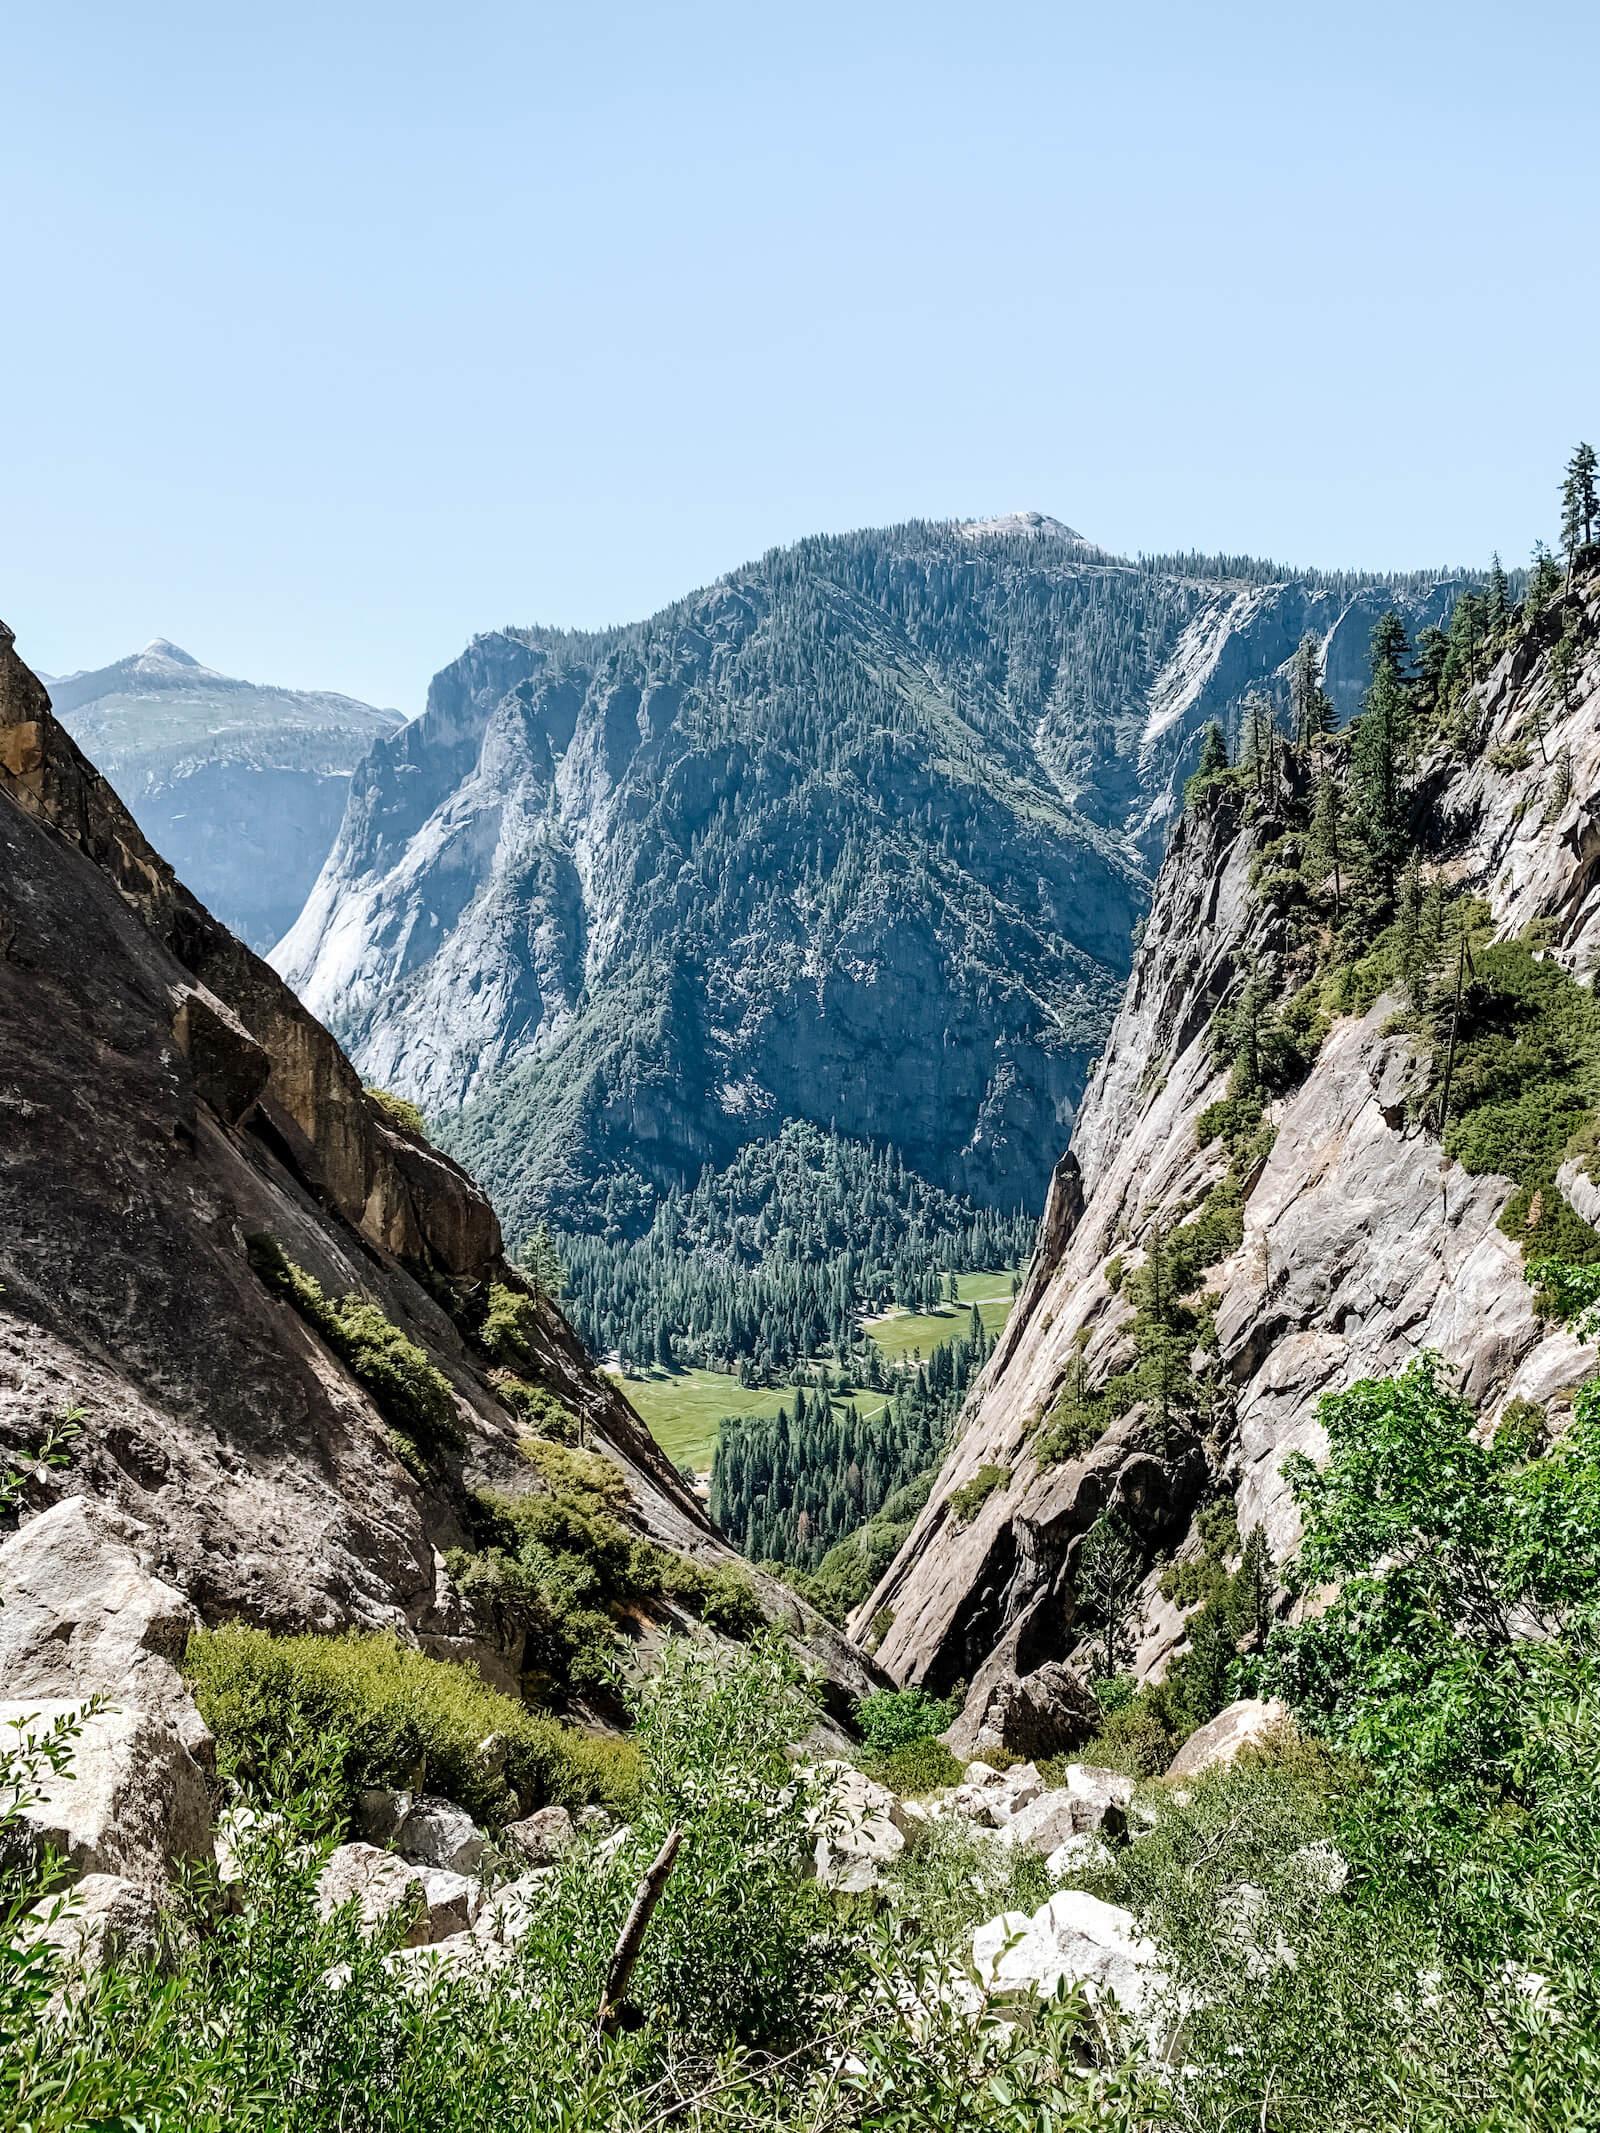 Yosemite National Park - Upper Yosemite Falls